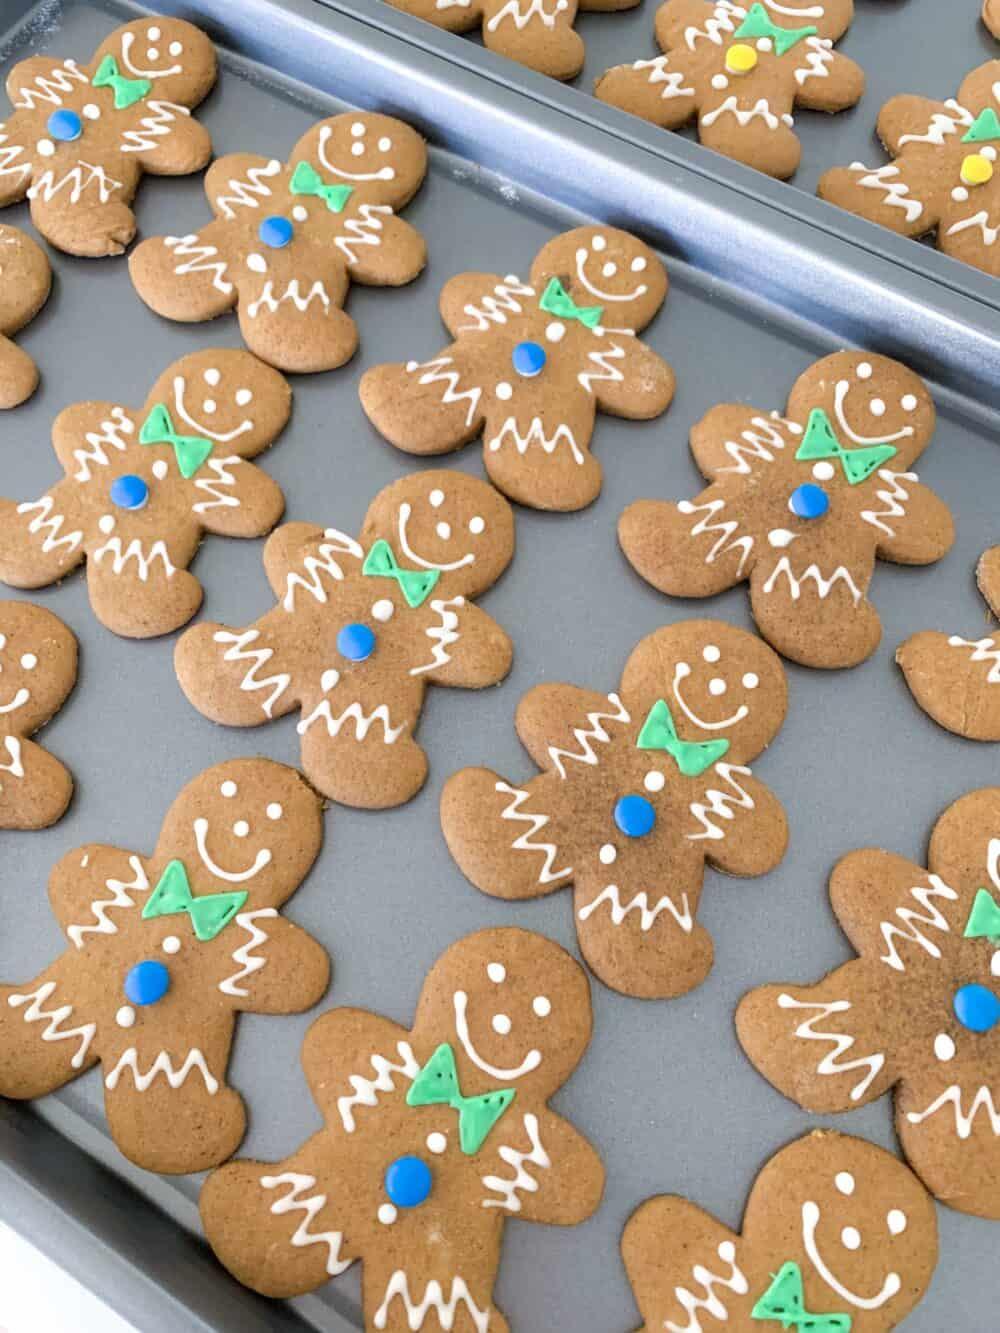 iced gingerbread man cookies on baking sheet